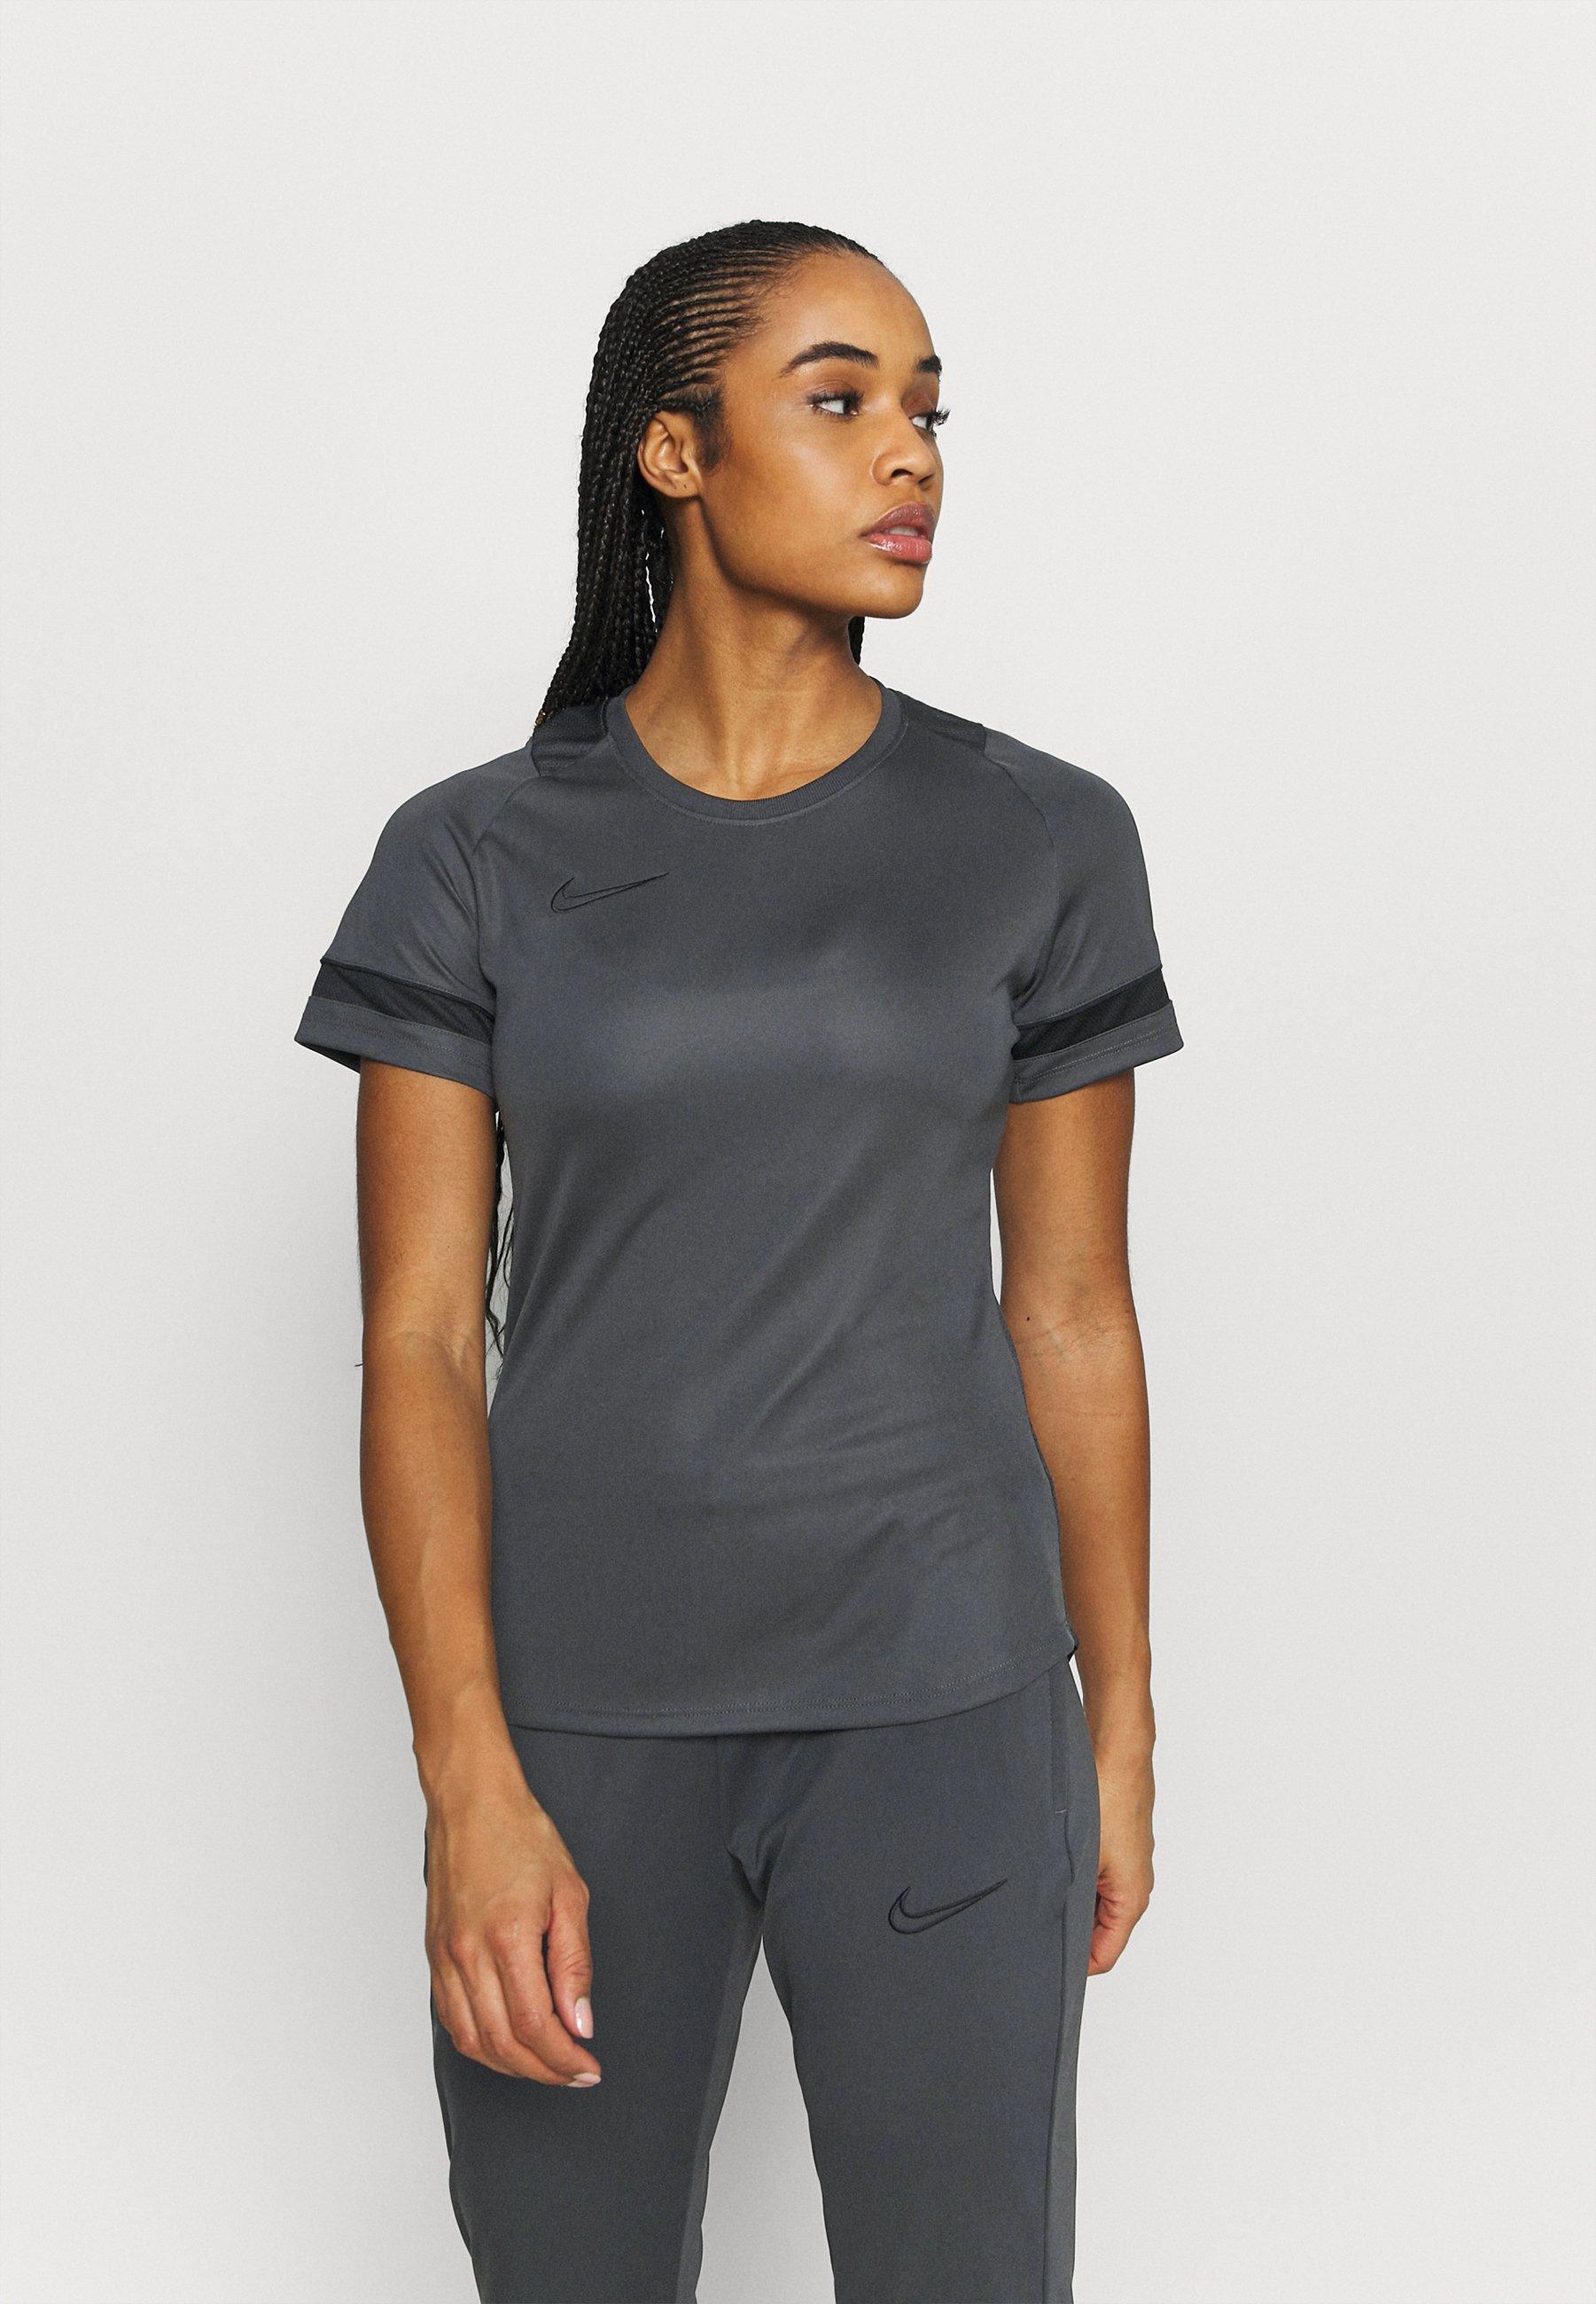 Femme ACADEMY 21 - T-shirt imprimé